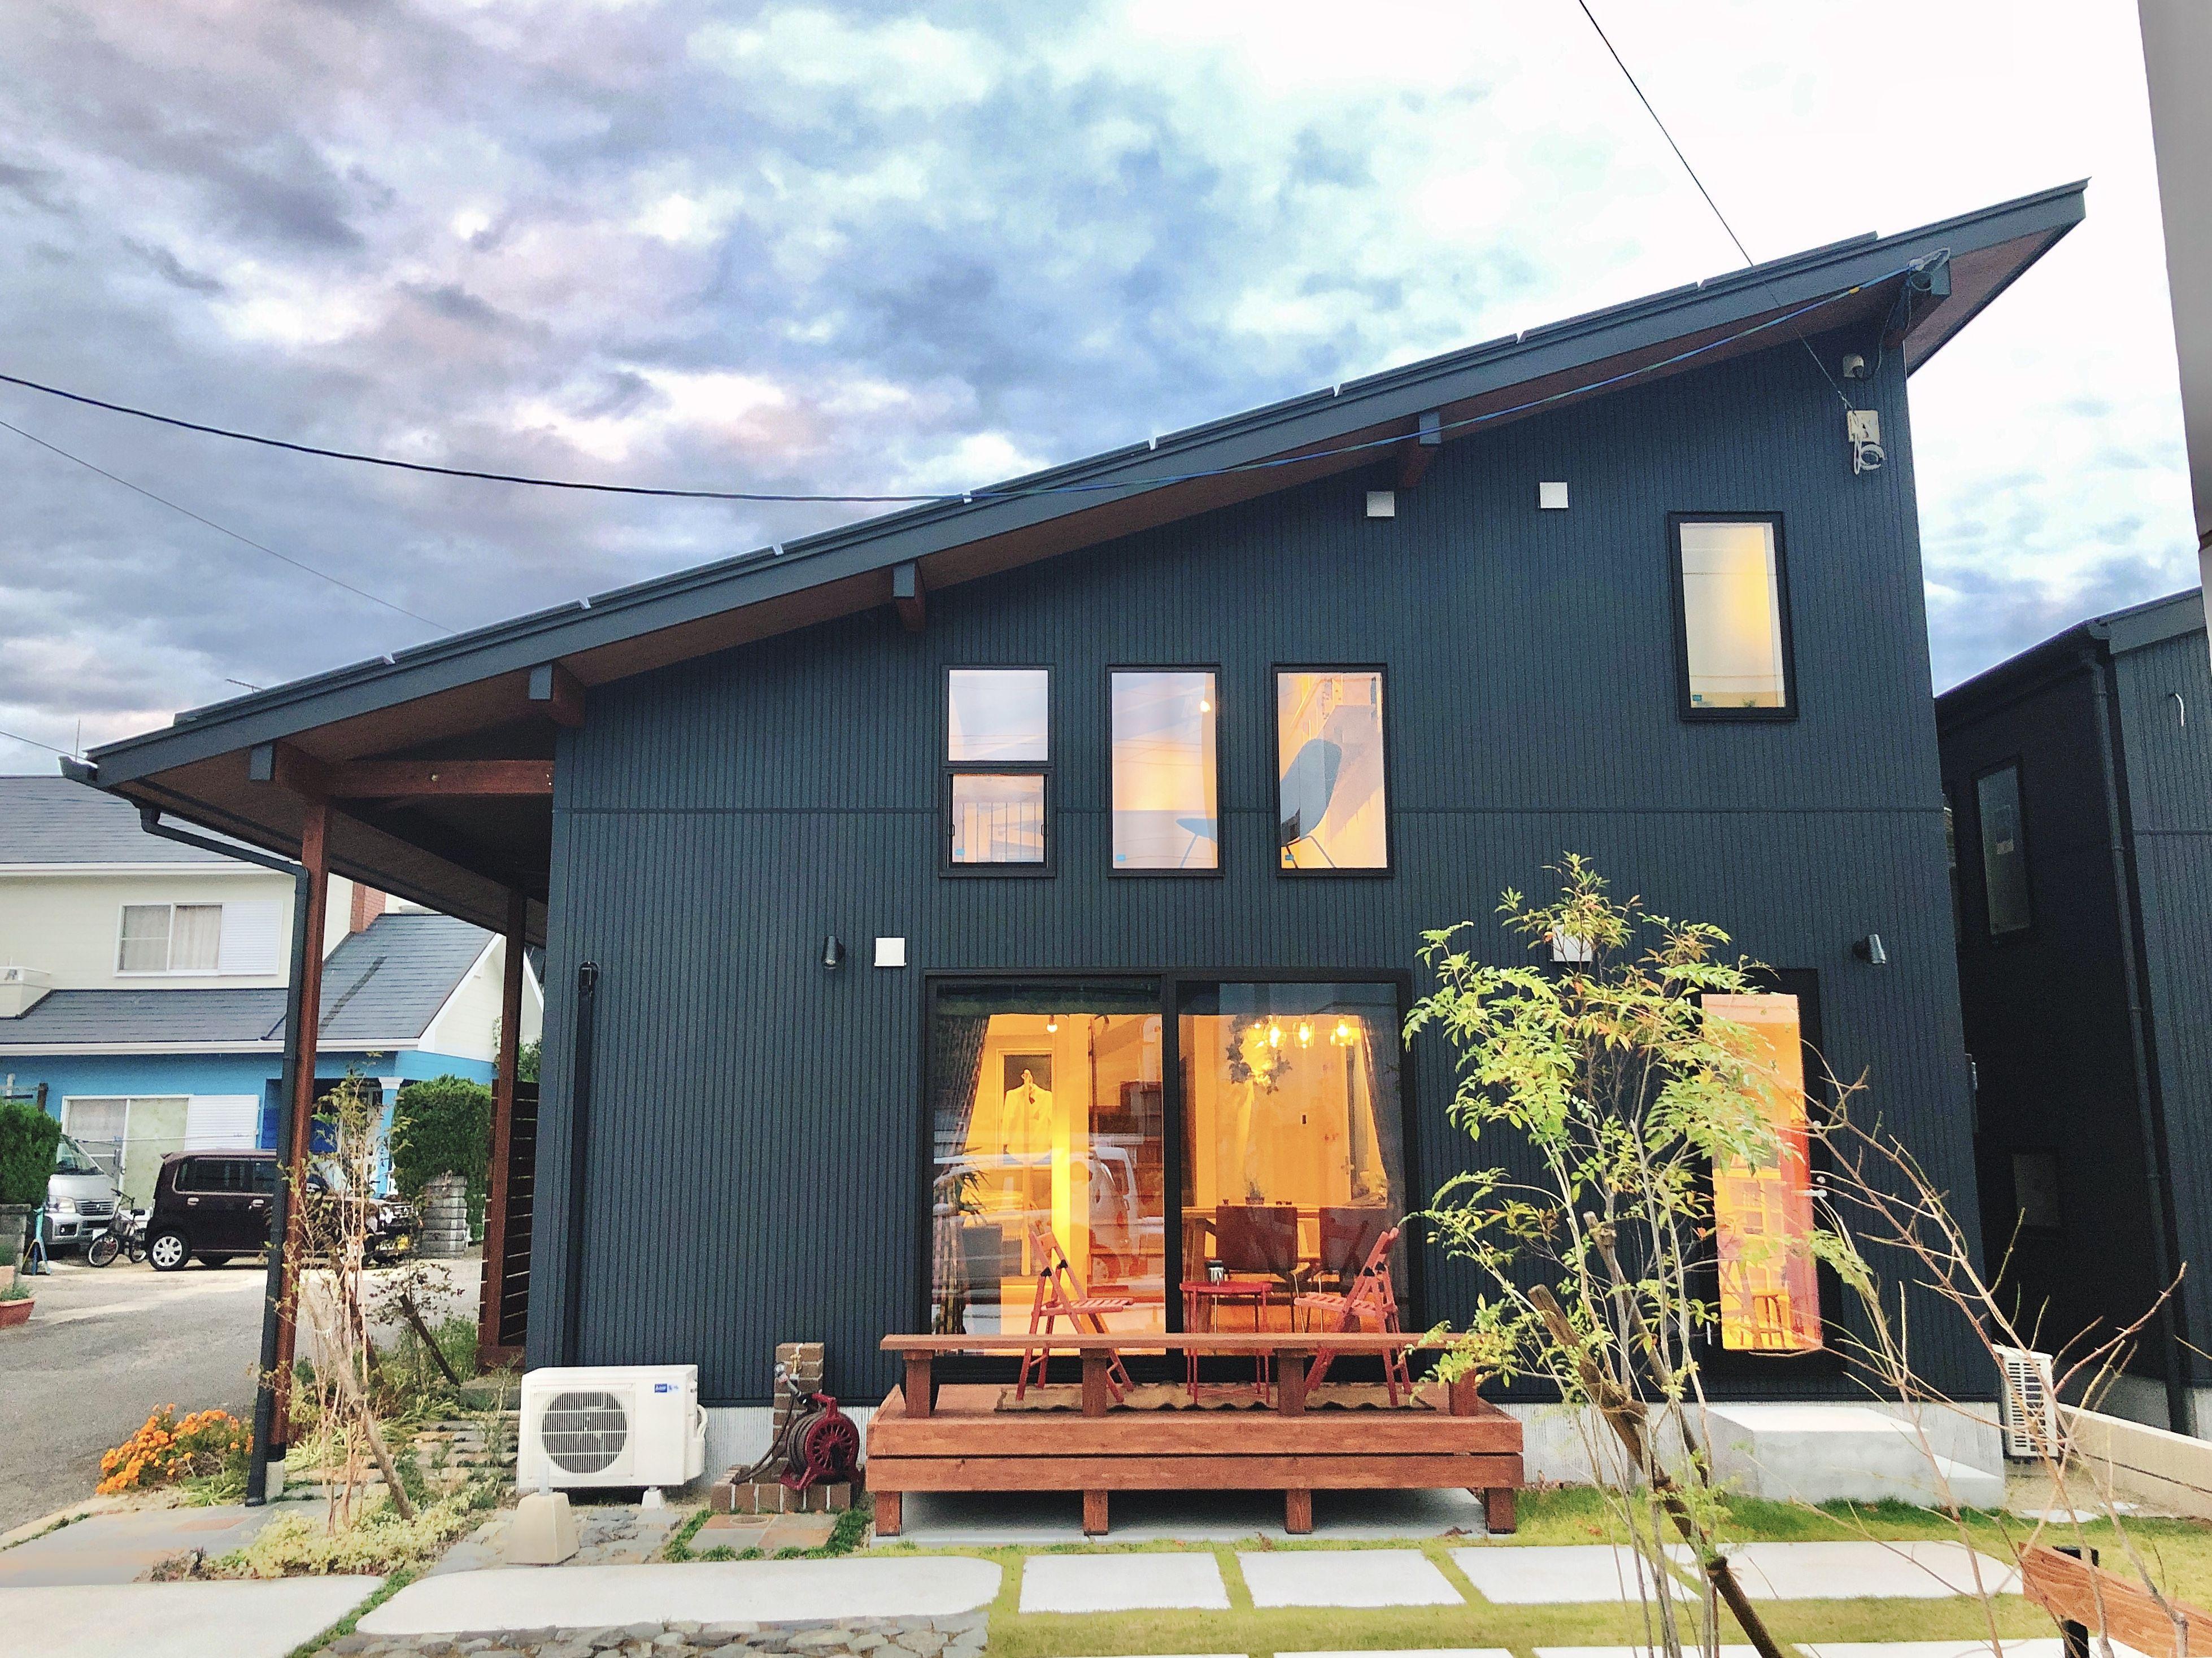 Loafer1 5 時津町 長崎で家を建てるならマイハウス 平屋外観